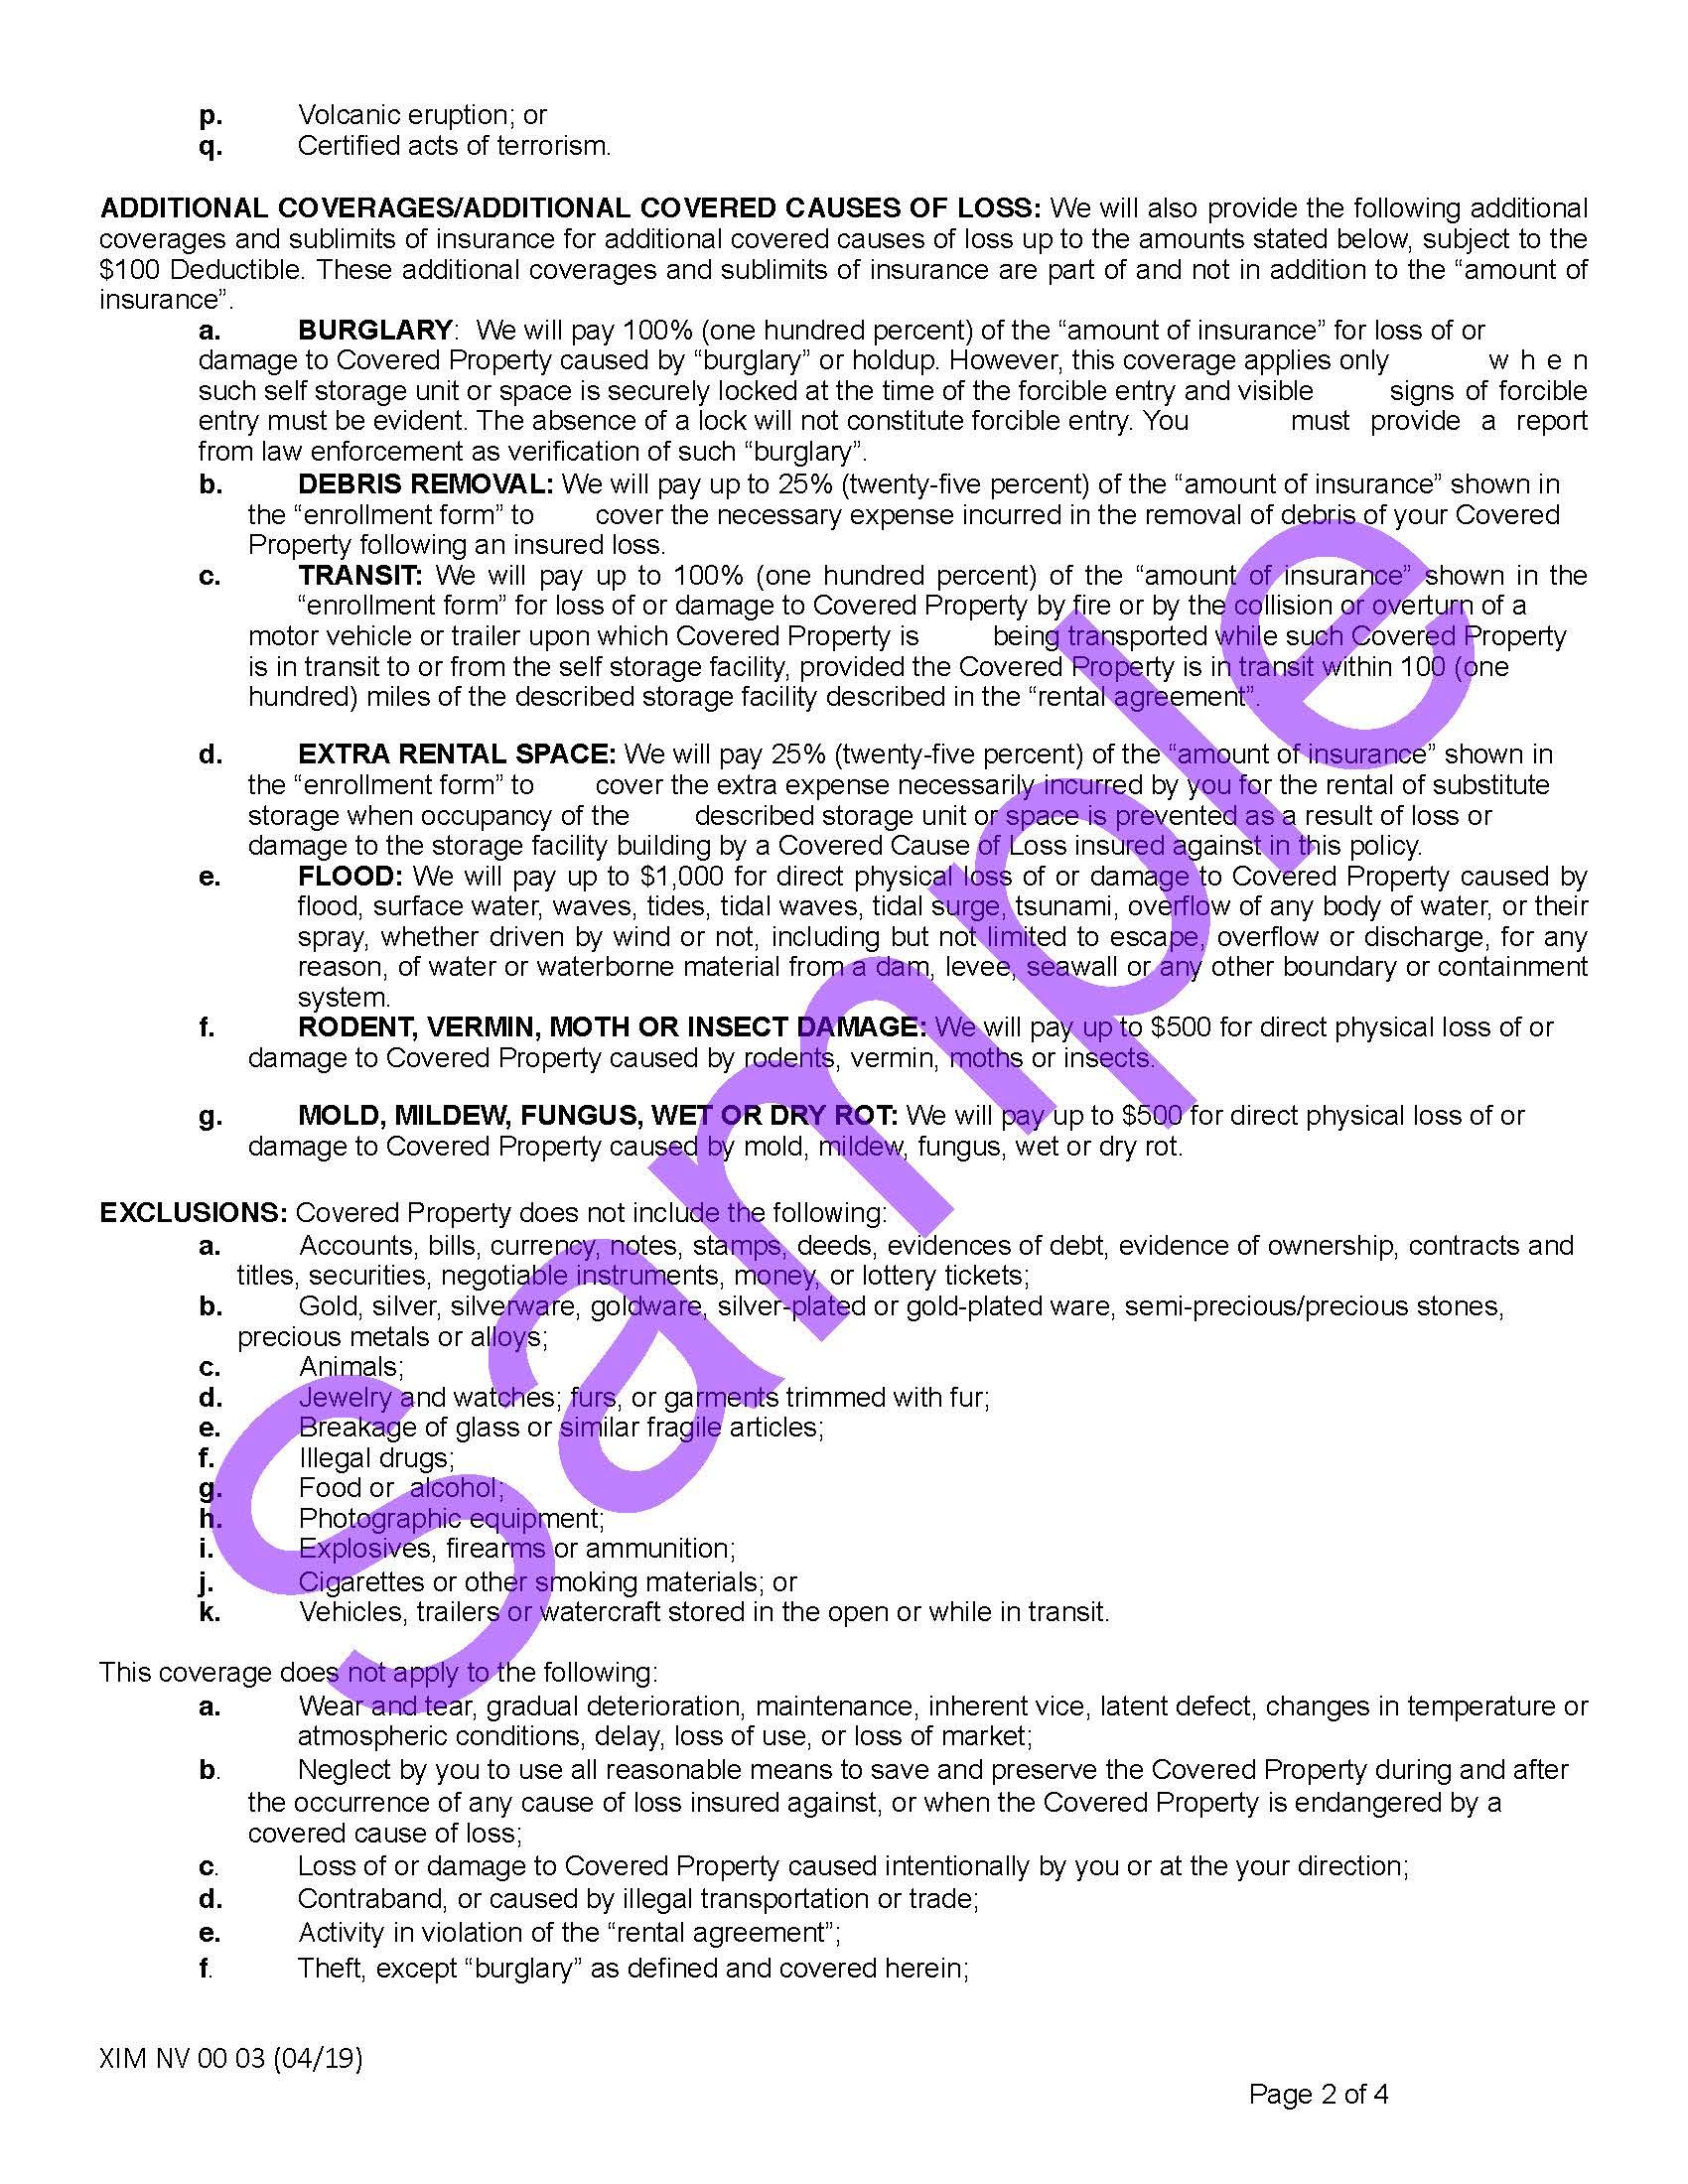 XIM NV 00 03 04 19 Nevada Certificate of InsuranceSample_Page_2.jpg